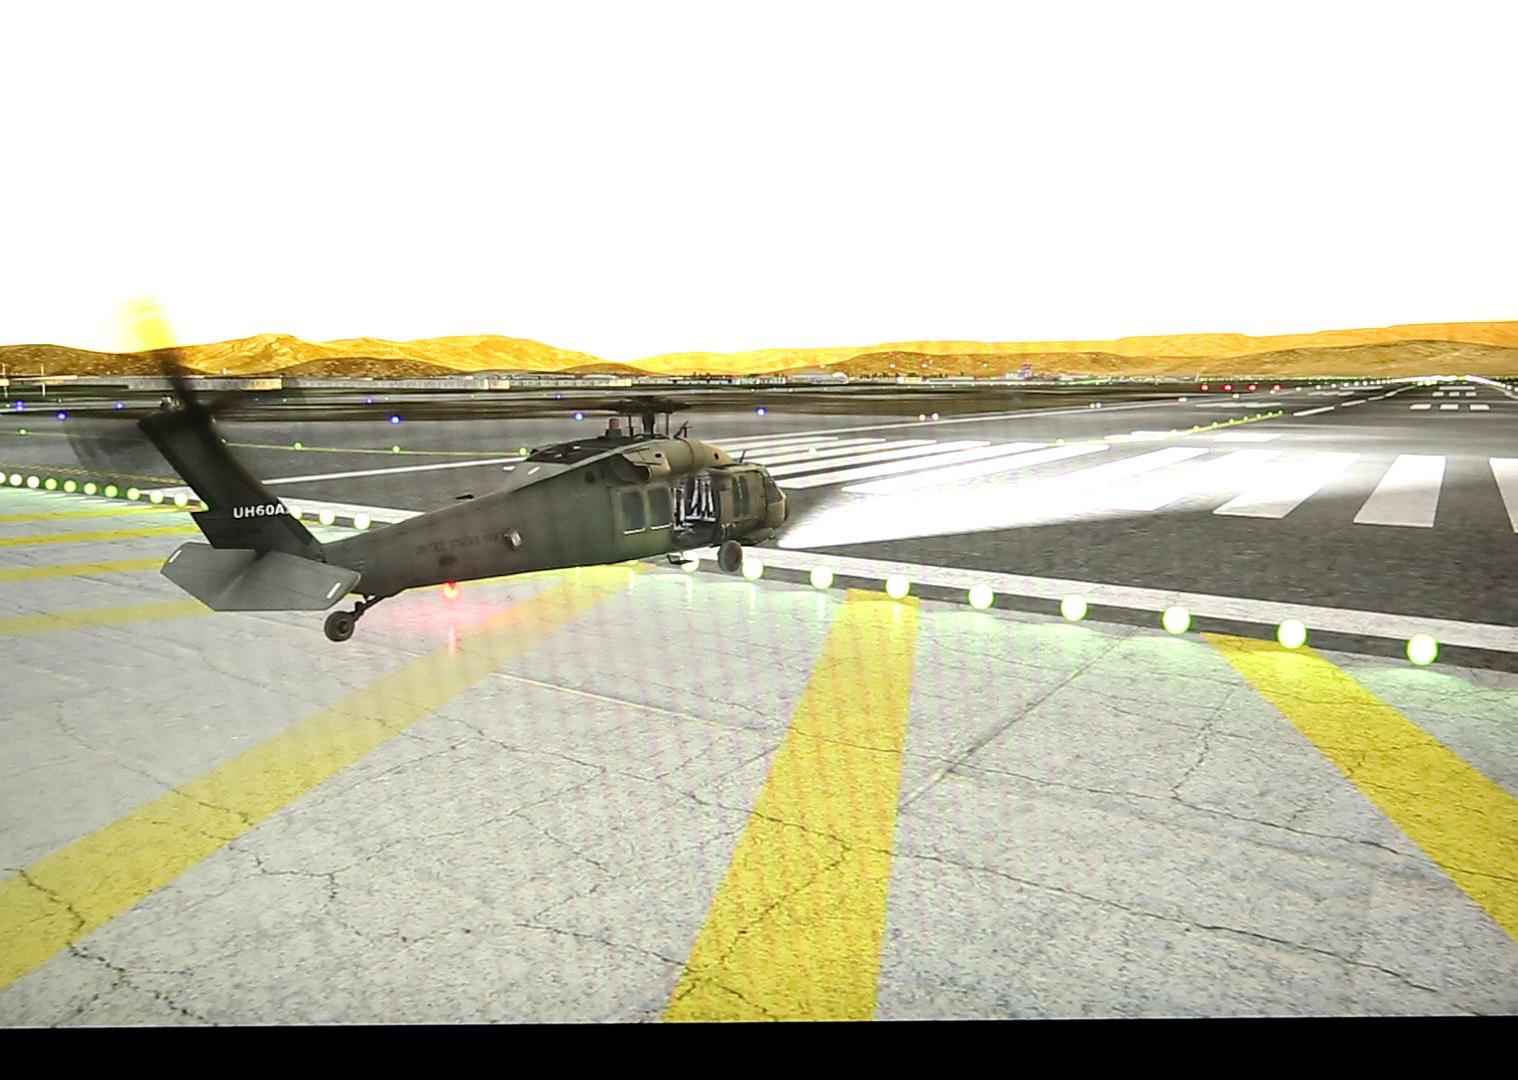 UH–60 Black Hawk